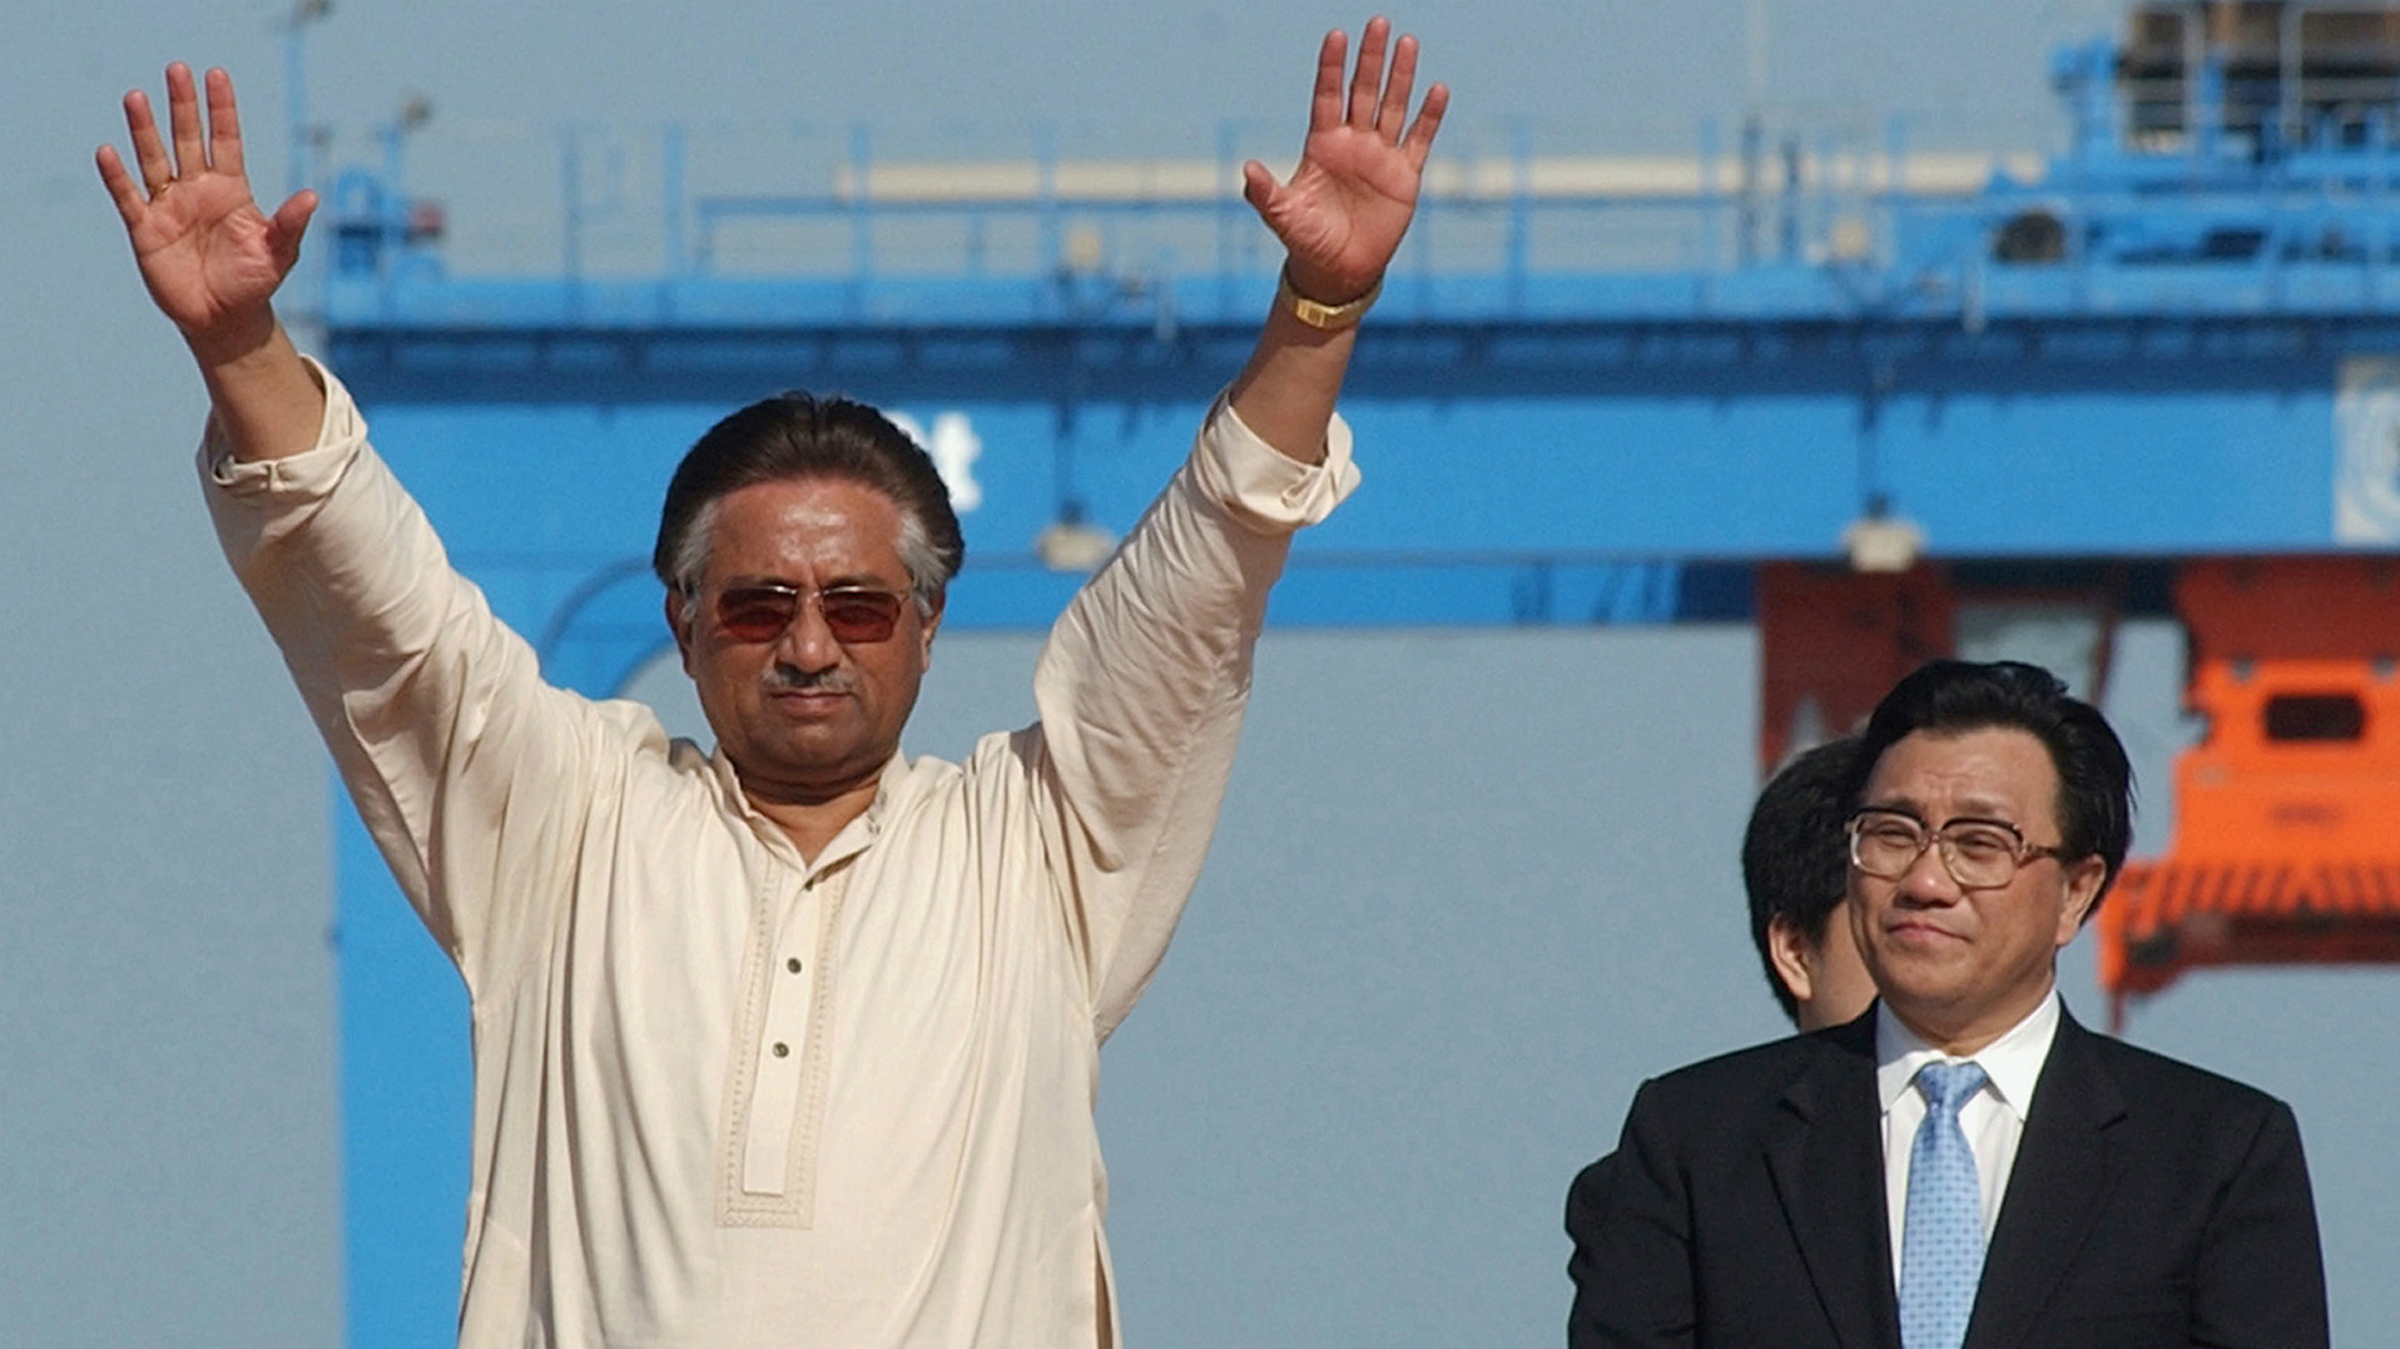 MusharrafGwadar.jpg